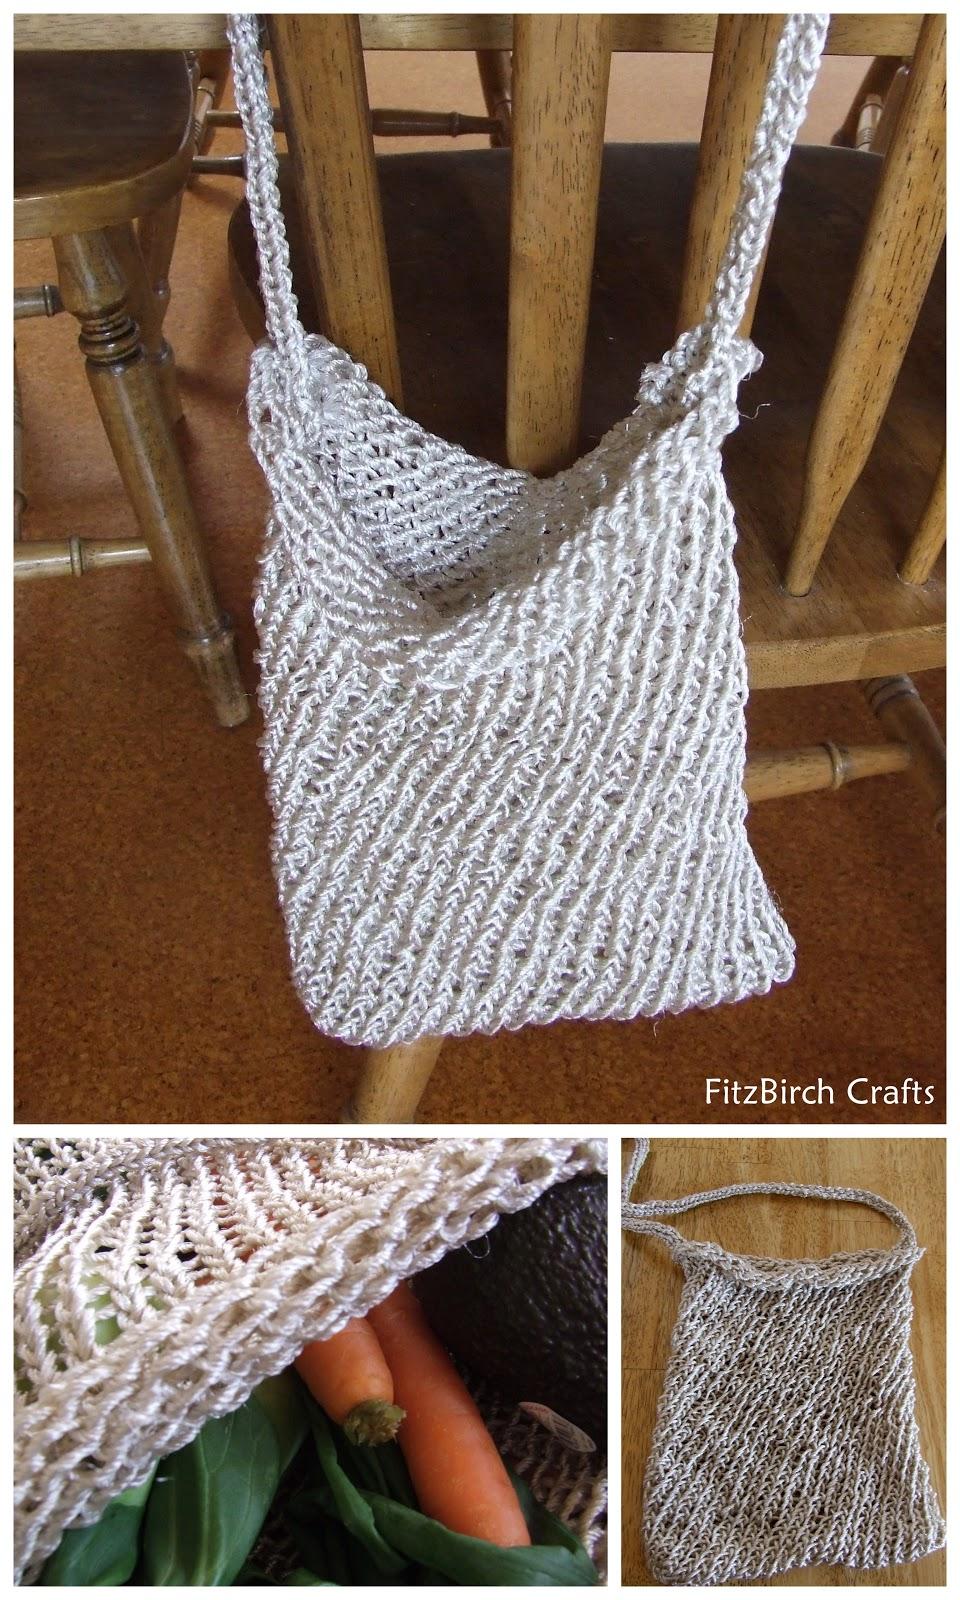 FitzBirch Crafts: Loom Knit Market bag